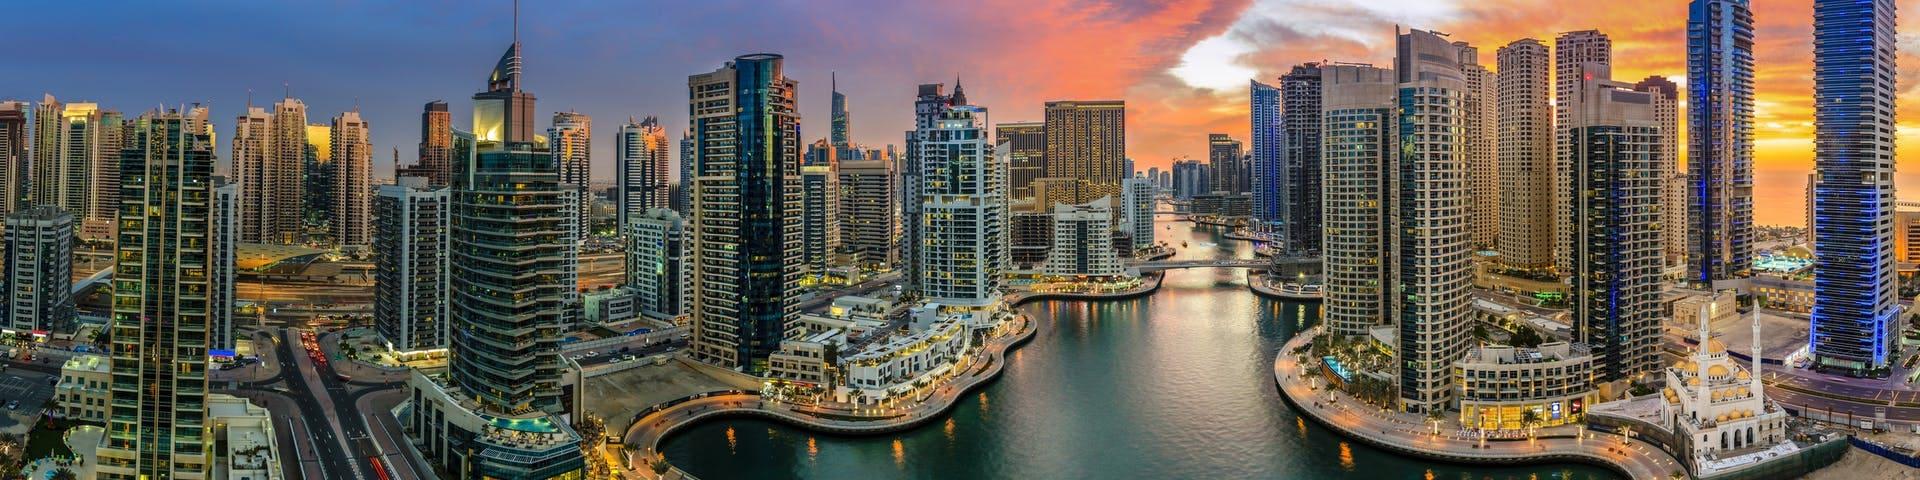 Panoramic view of Dubai Marina at sunset